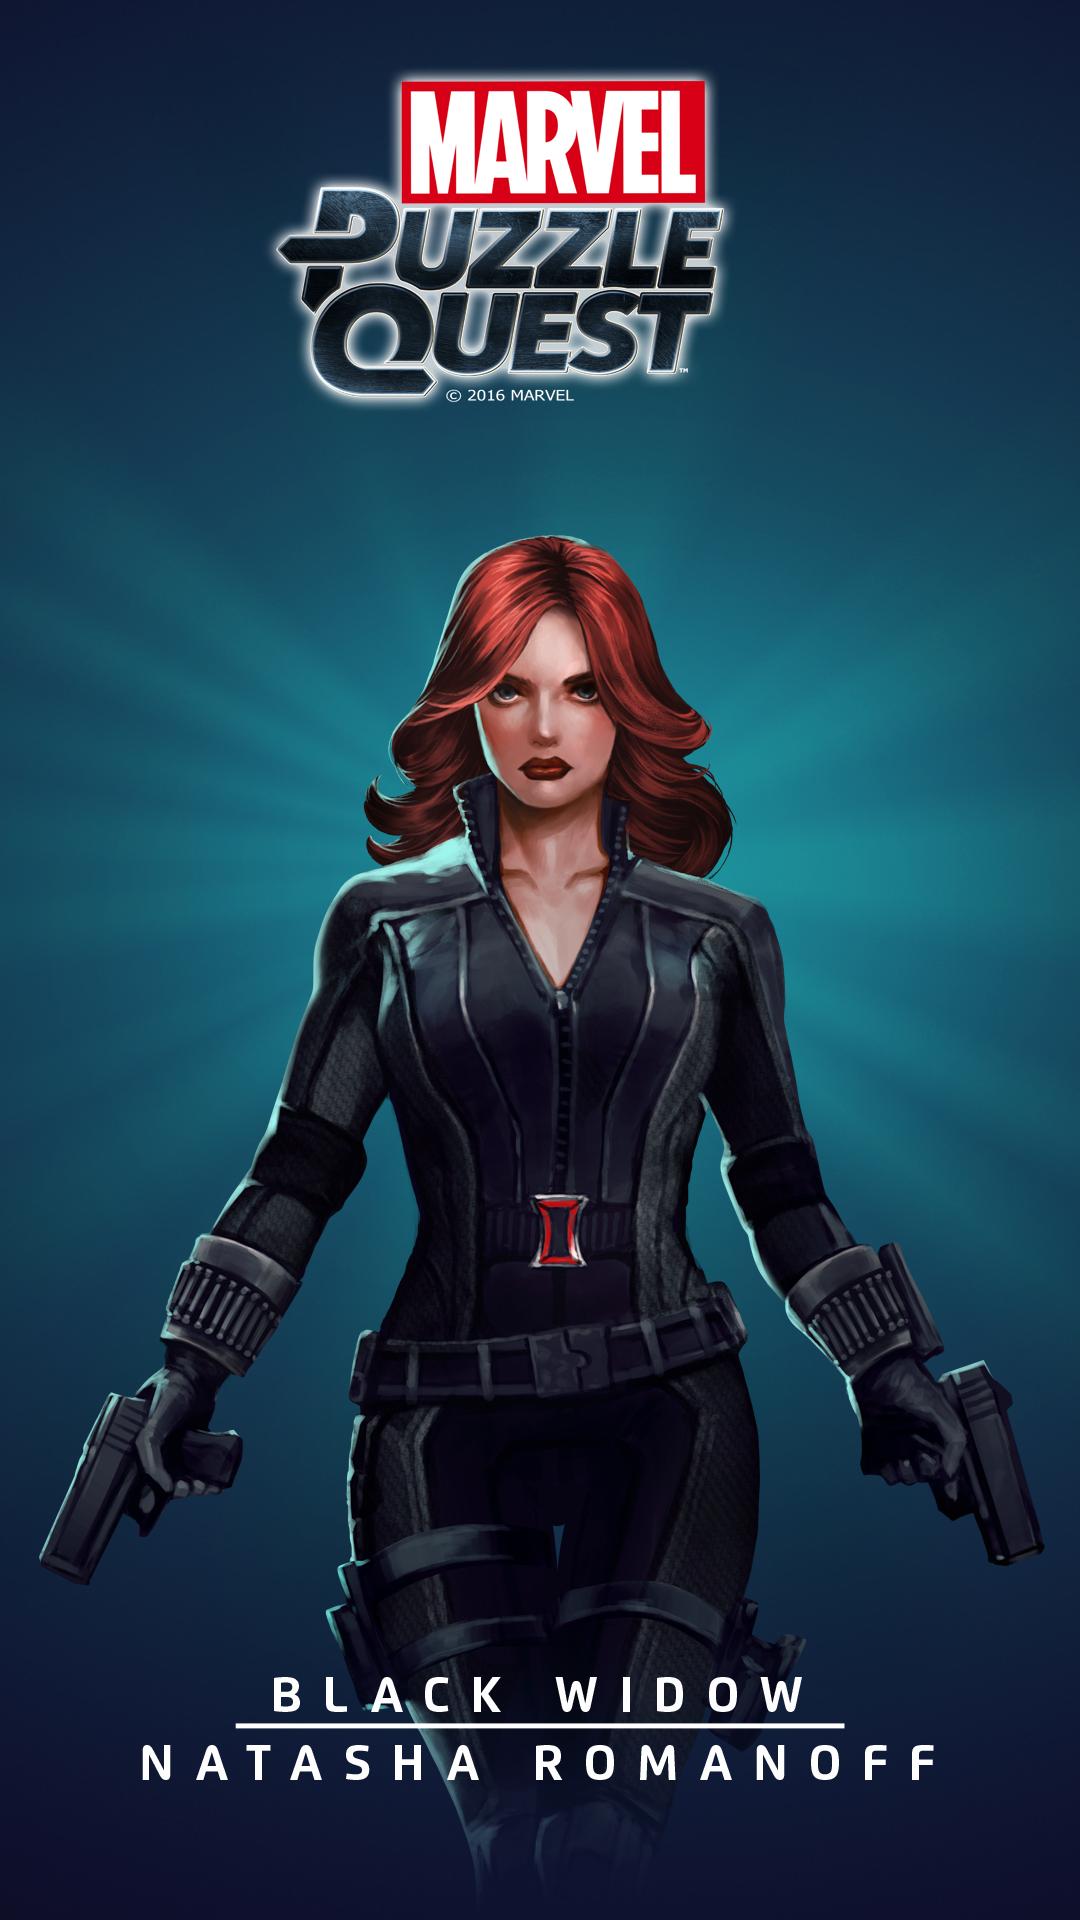 Blackwidowmcu Poster 01 Png 1080 1920 Black Widow Marvel Marvel Puzzle Marvel Superheroes